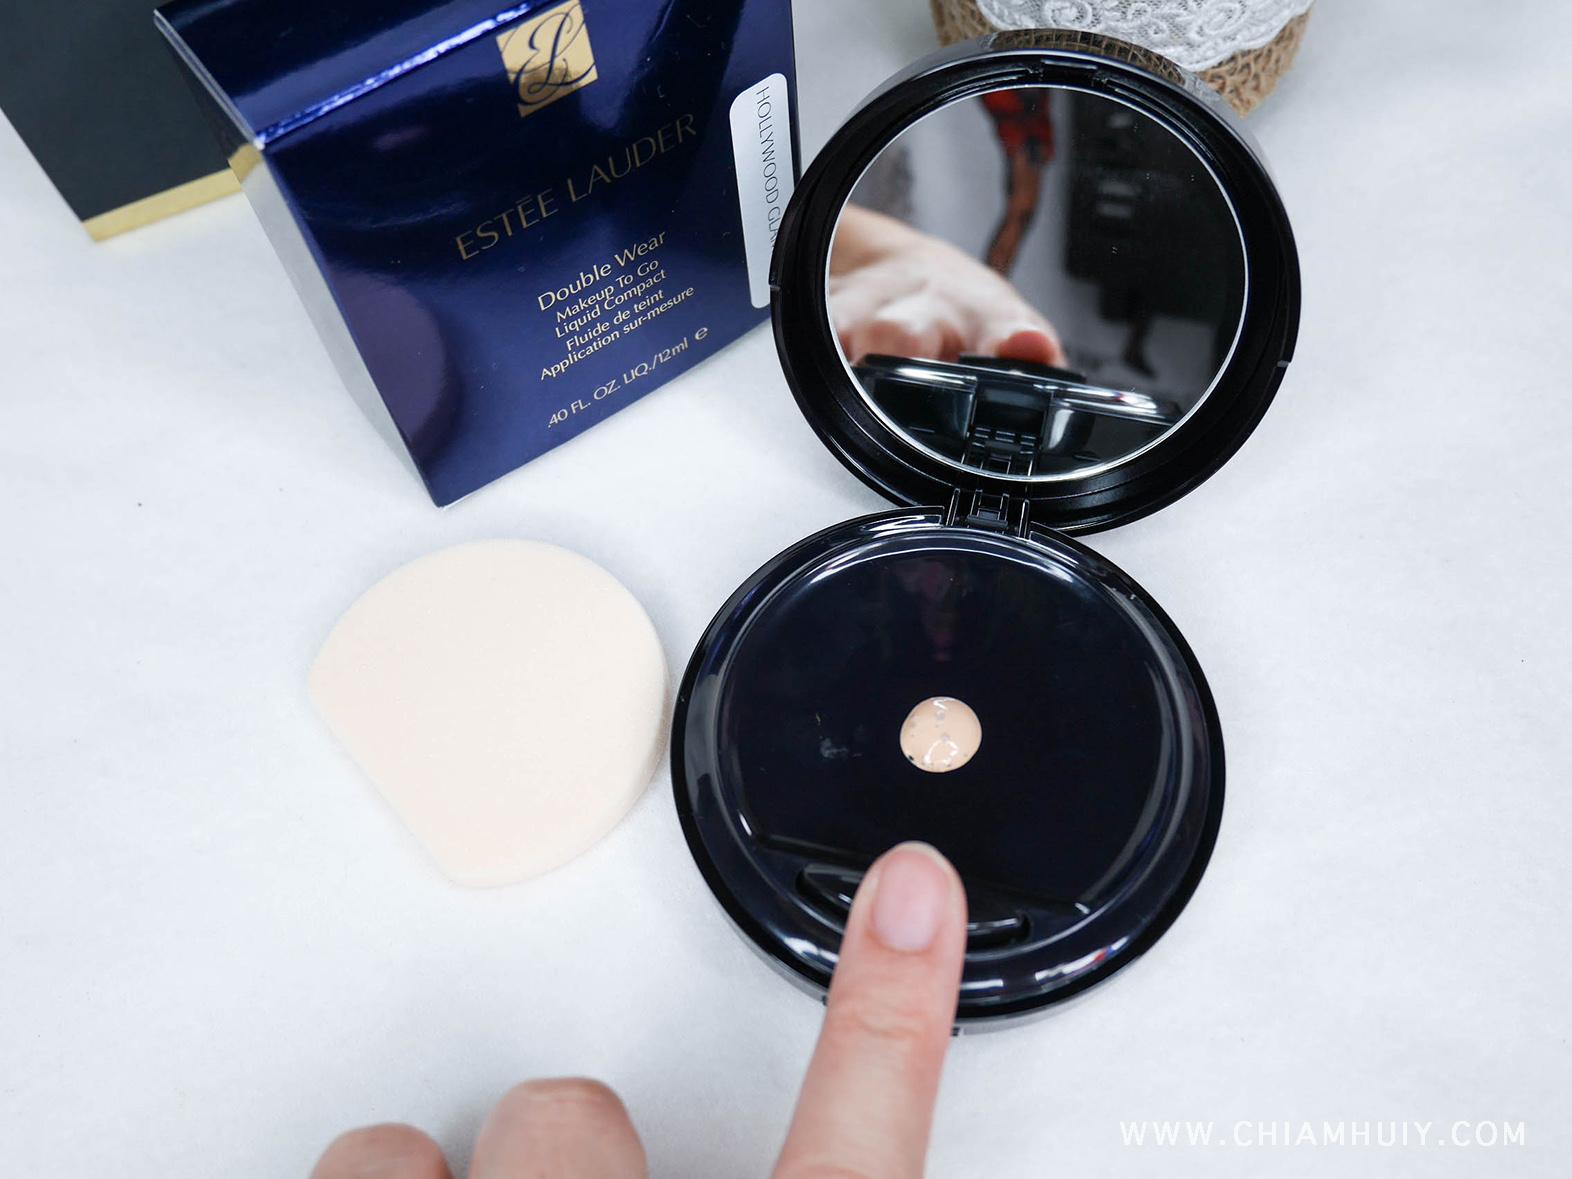 Estee Lauder Double Wear Makeup To Go Liquid Foundation